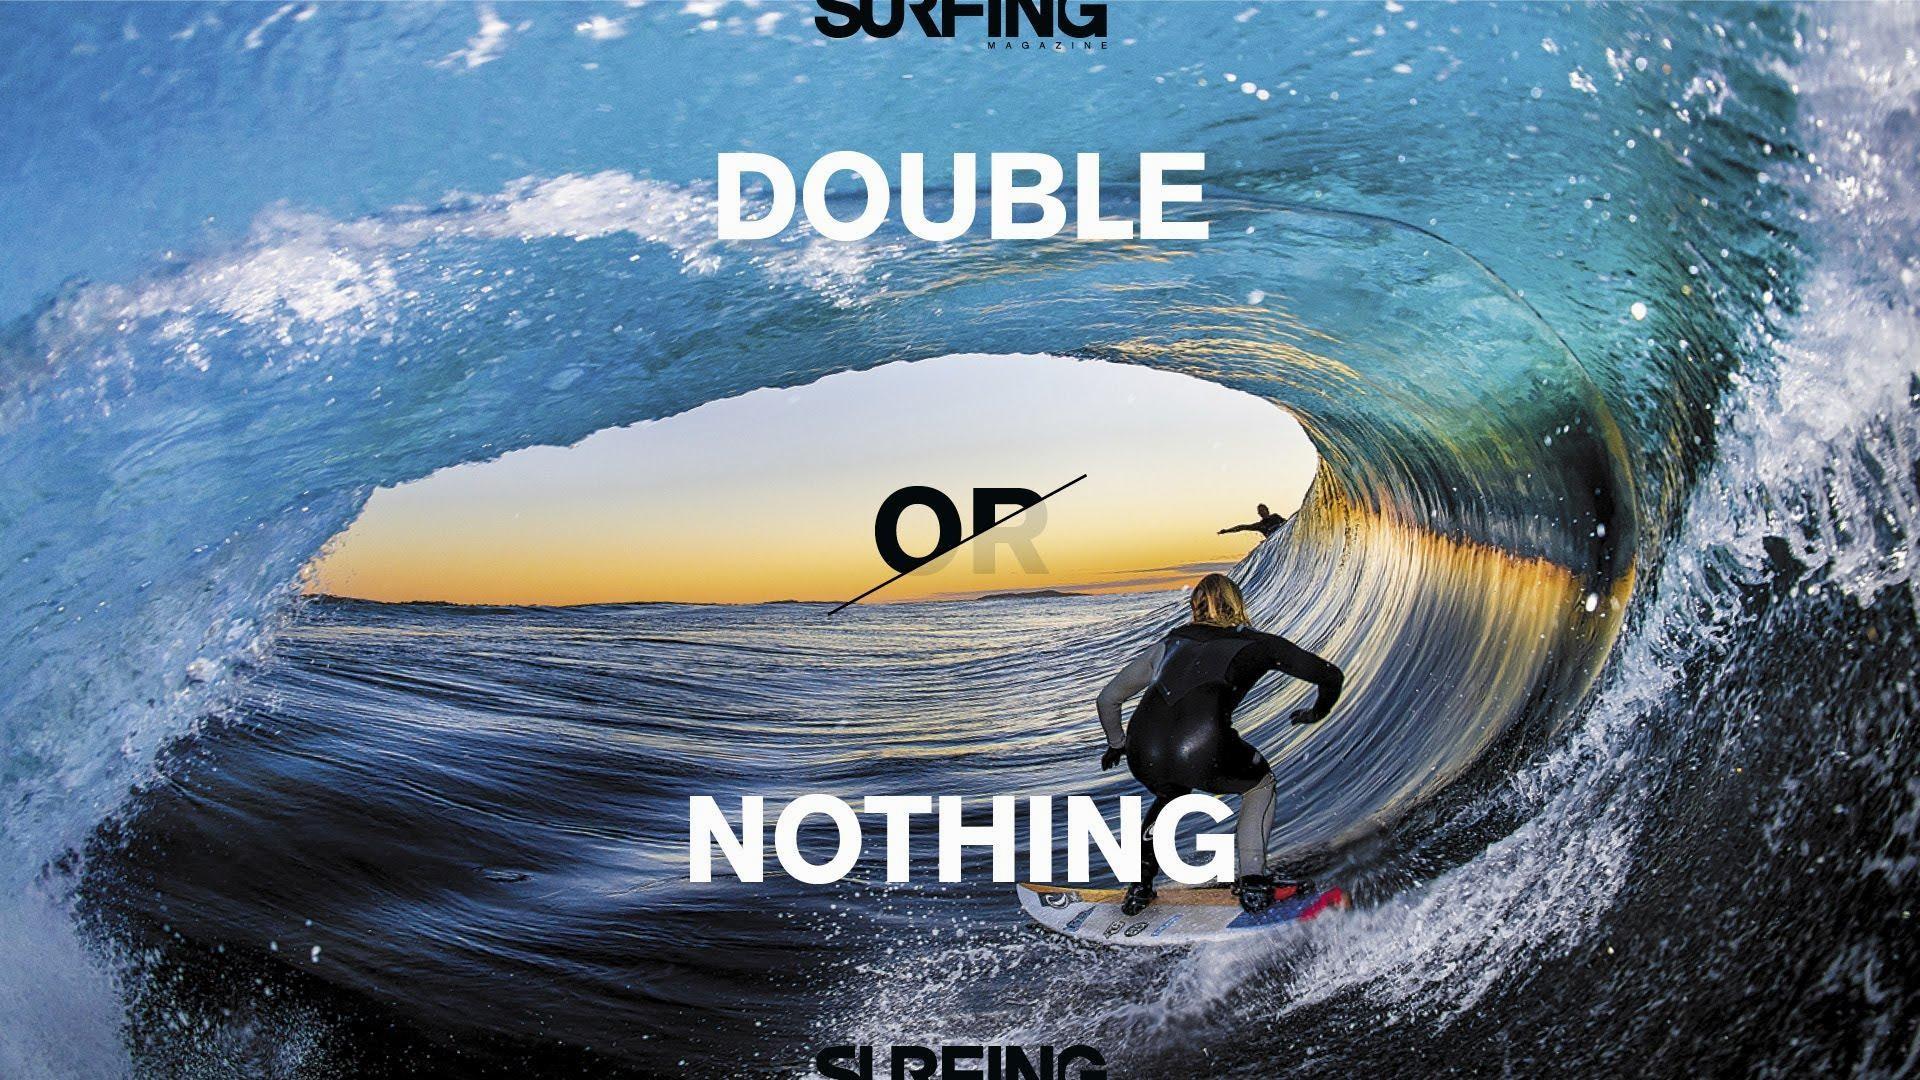 7. surfer-magazine-wallpaper-HD6-600×338